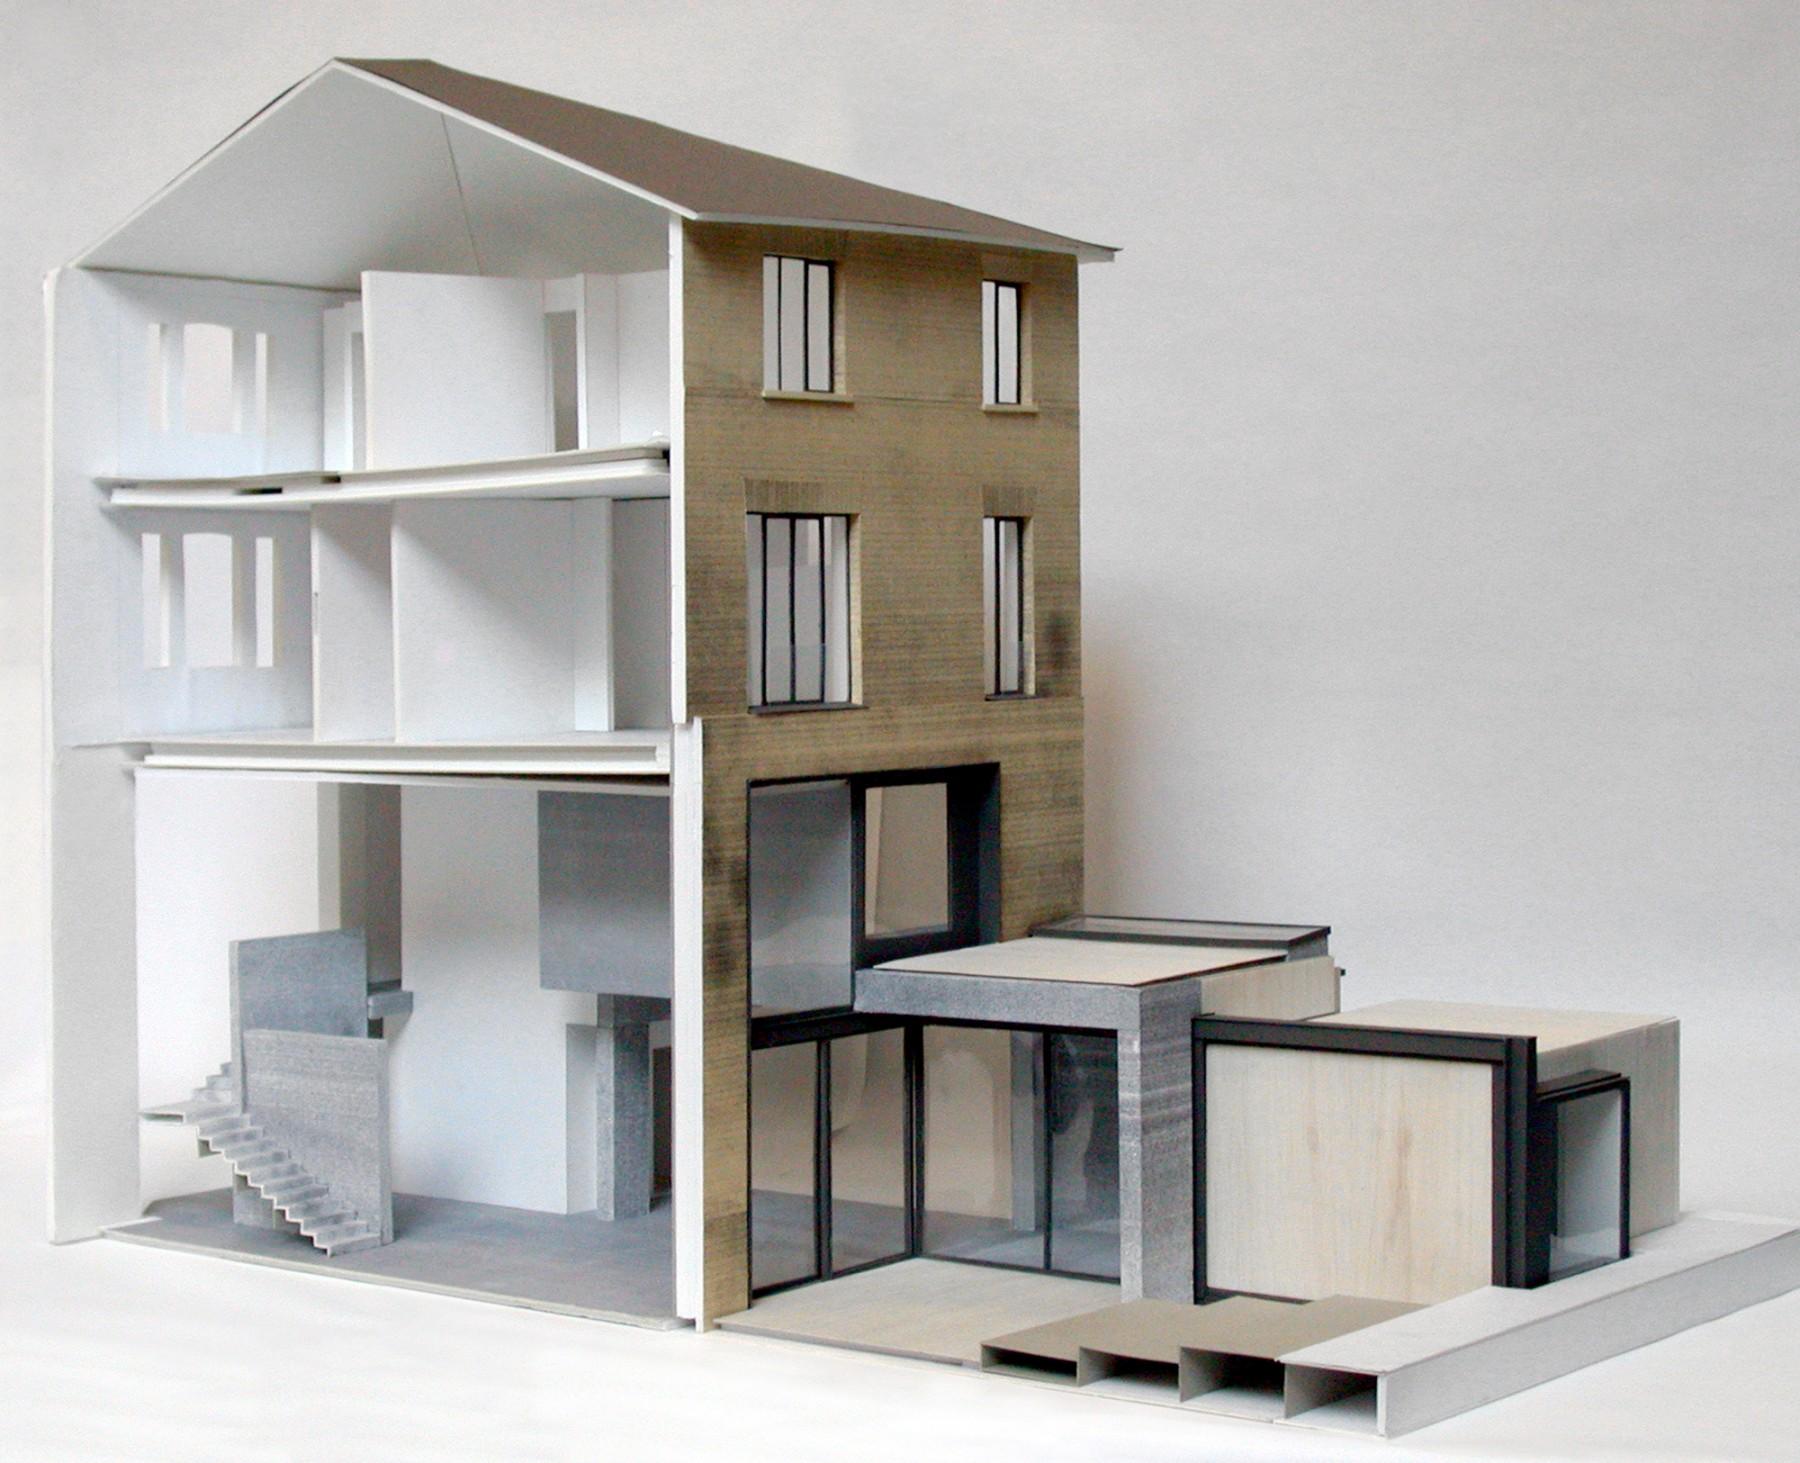 Kander-house-Primrose-hill-London-residential-home-contemporary-interior-Riba-award-victorian-Jamie-Fobert-Architects-model